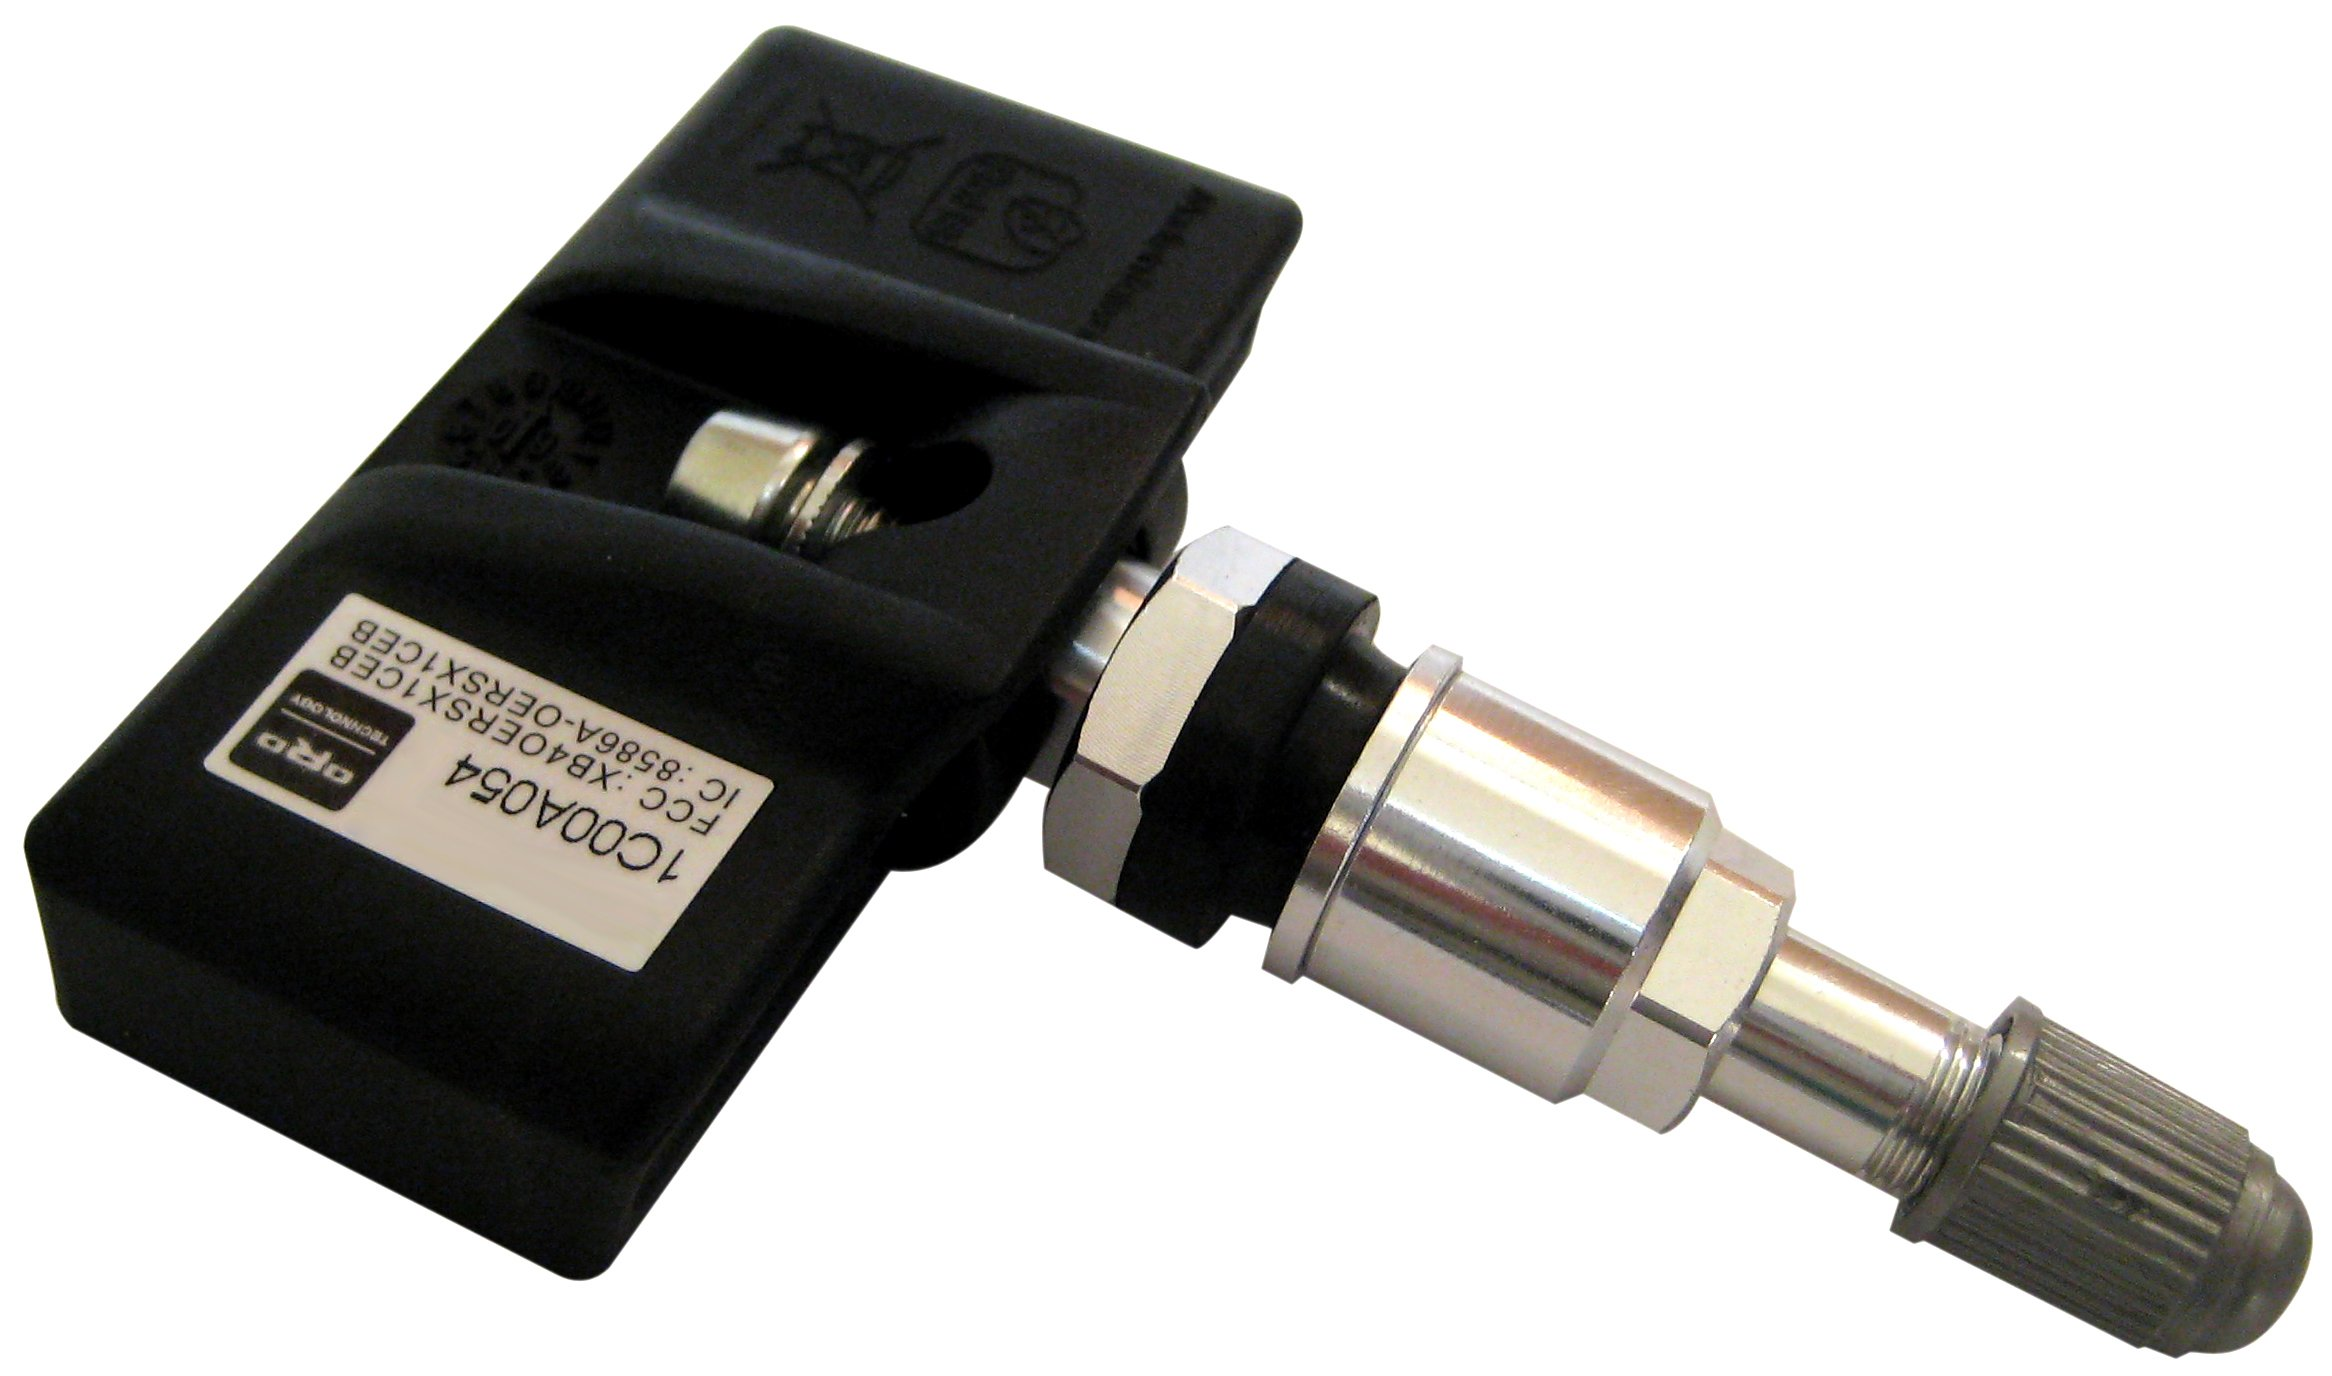 ORO-Tek OSC-8214B-M TPMS